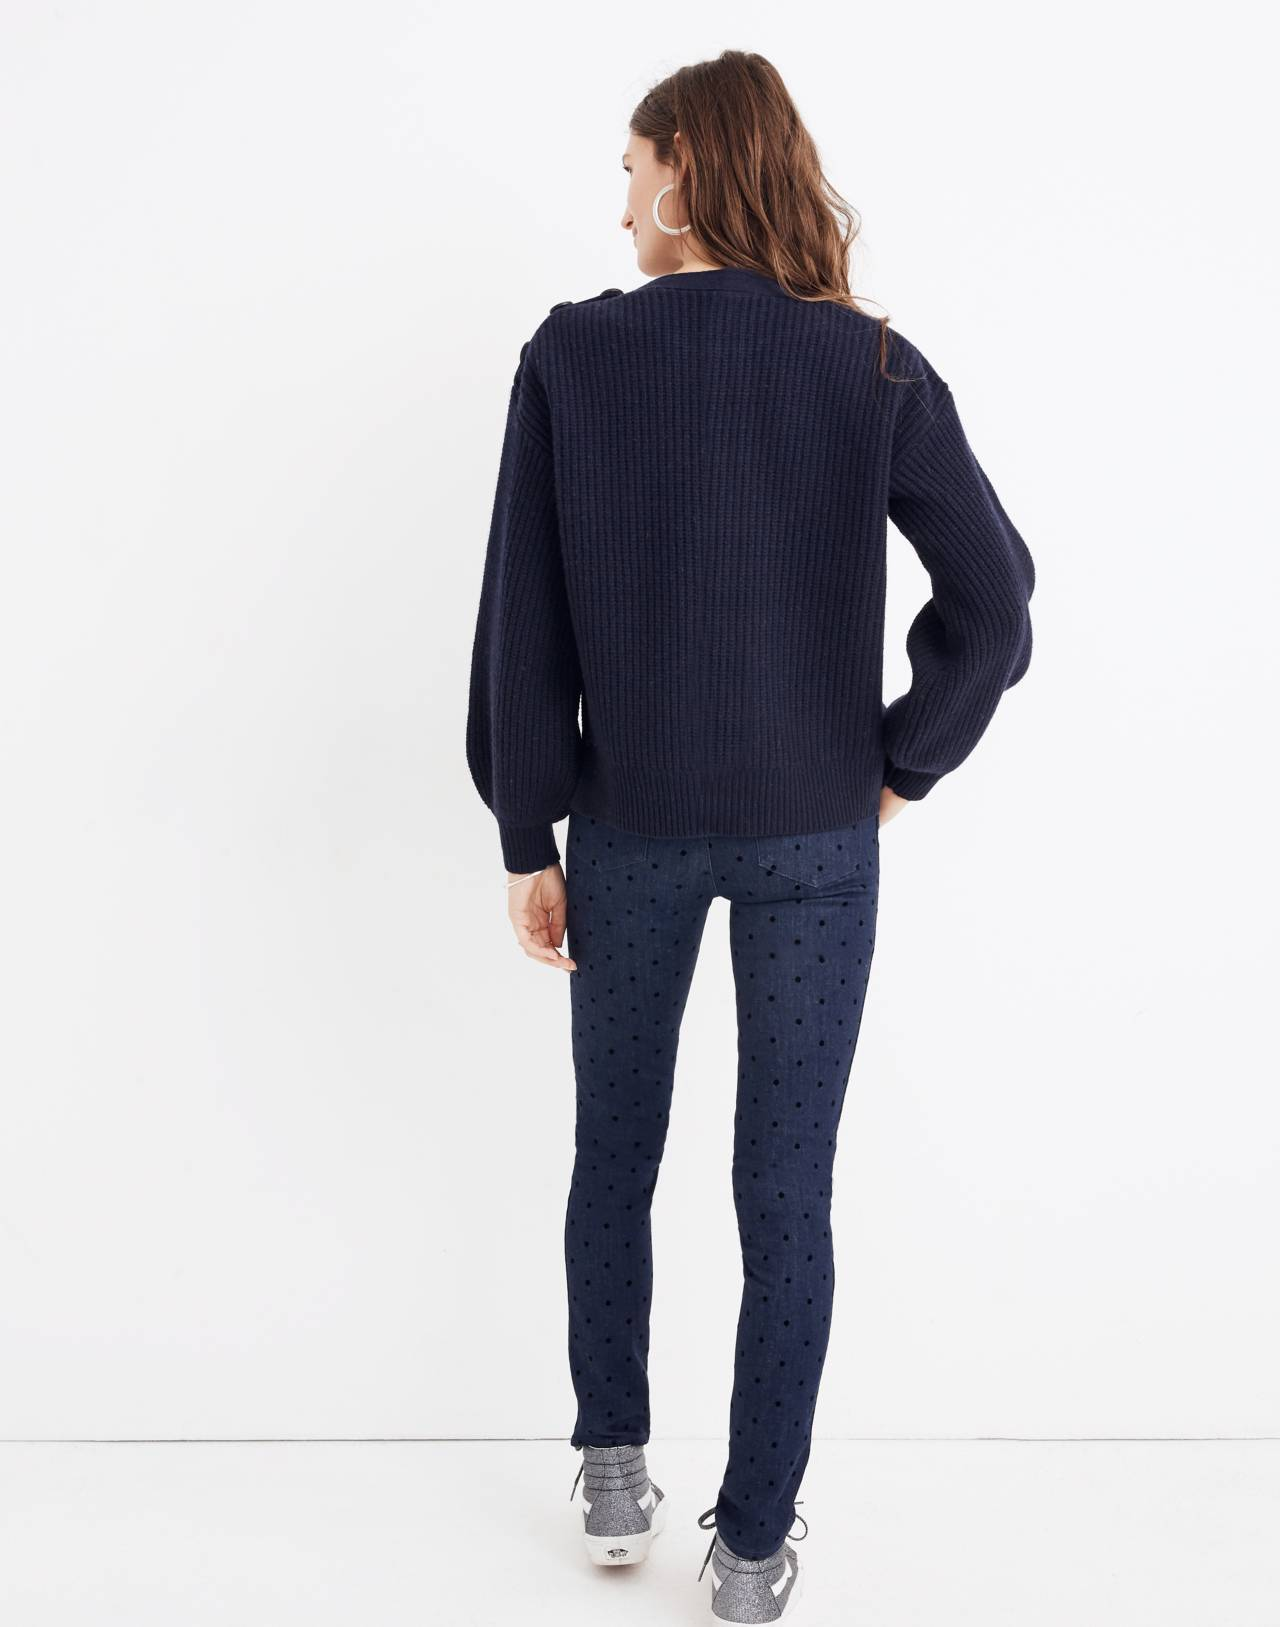 Boatneck Button-Shoulder Sweater in navy image 3